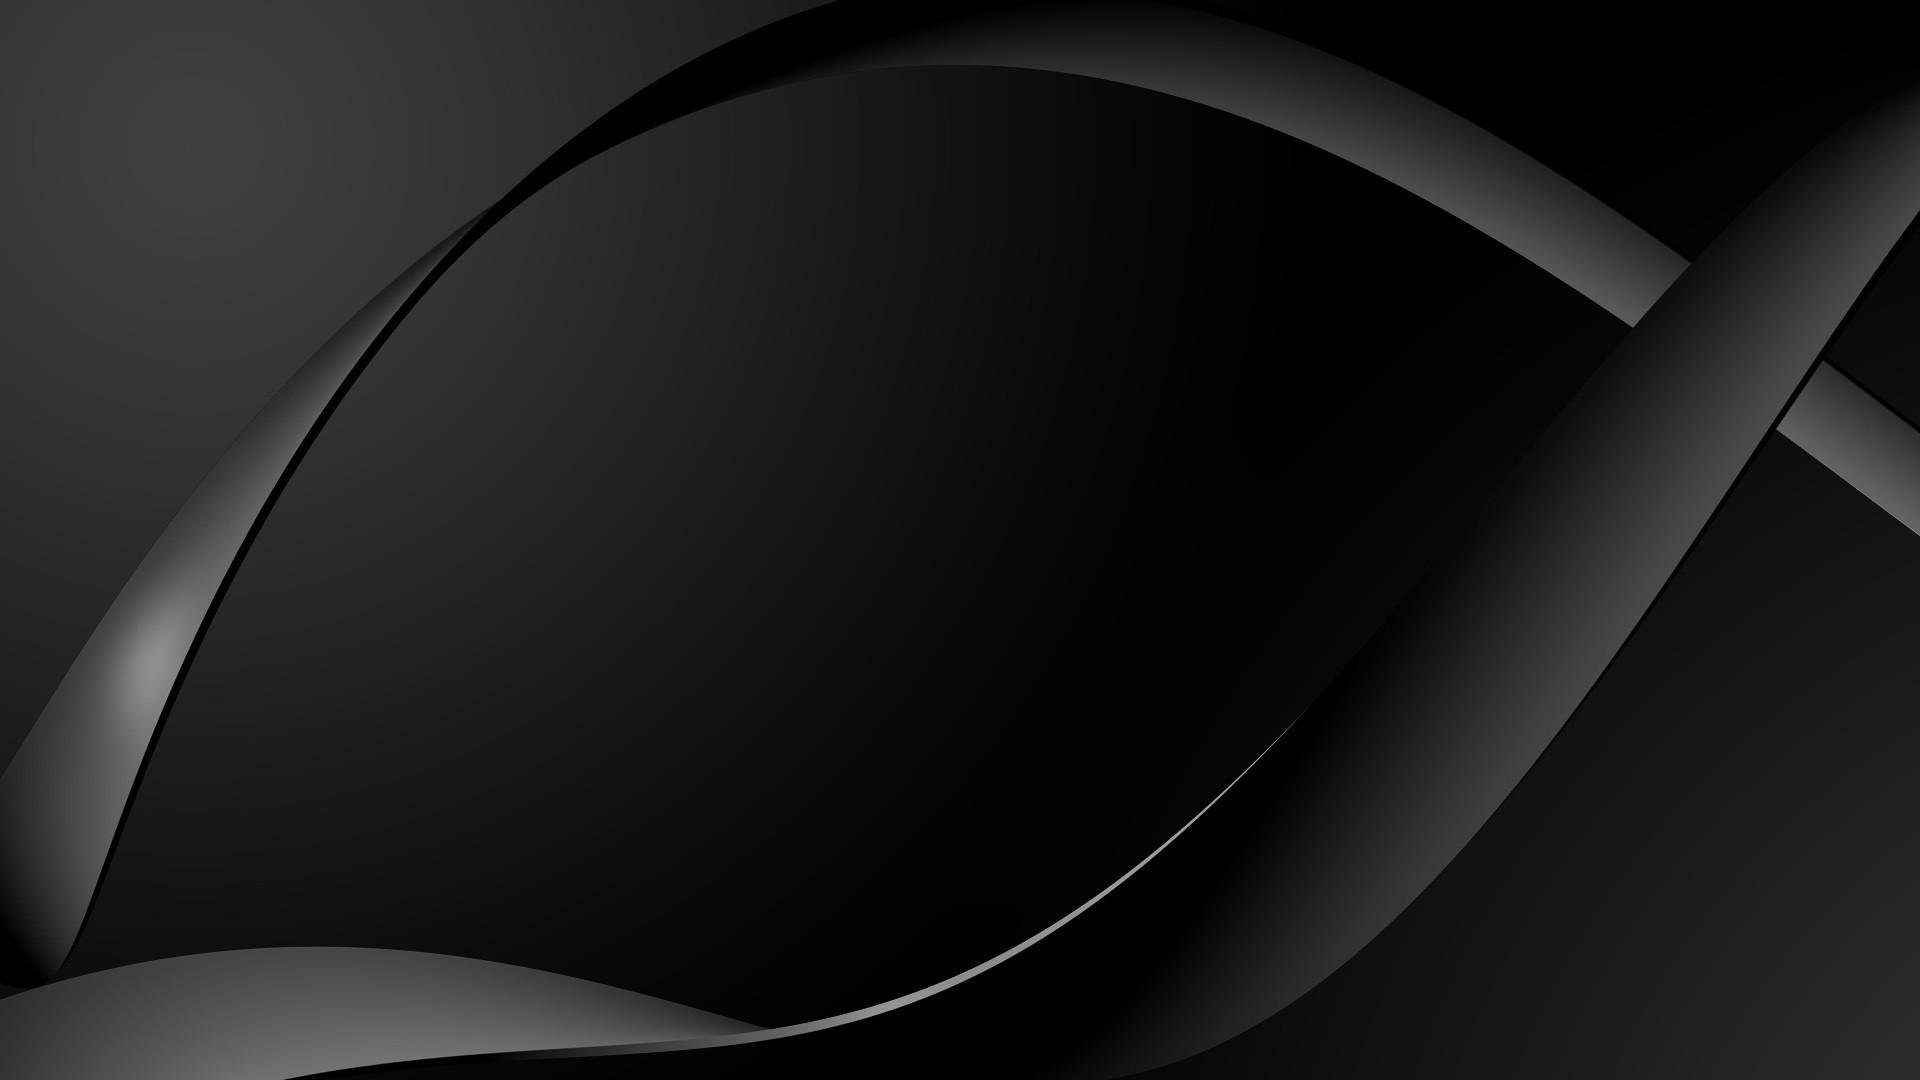 Black Waves Black Wallpaper Hd Abstract 2186292 Hd